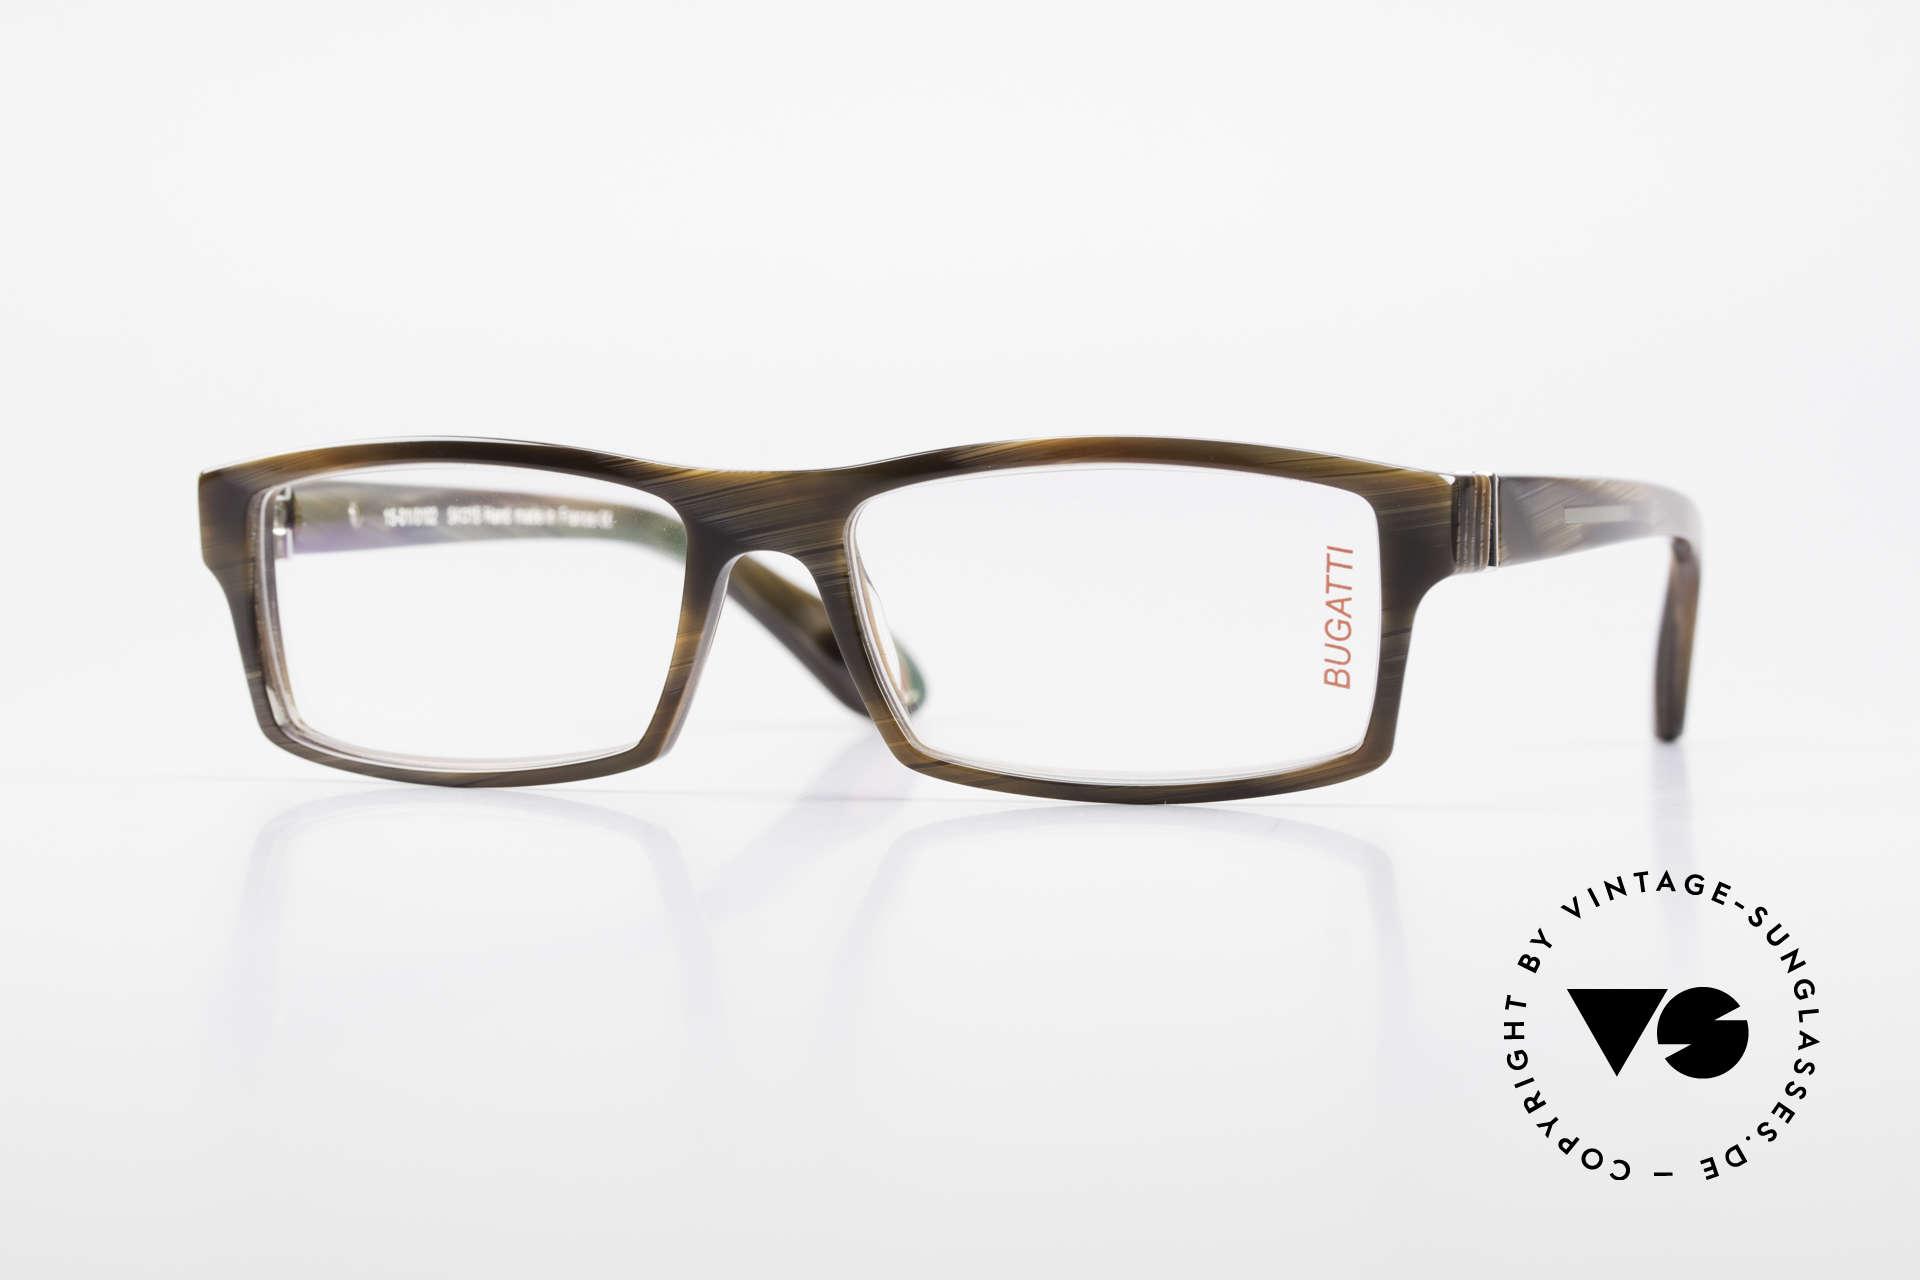 Bugatti 486 Striking Luxury Men's Glasses, striking high-tech eyeglass-frame by BUGATTI, Made for Men